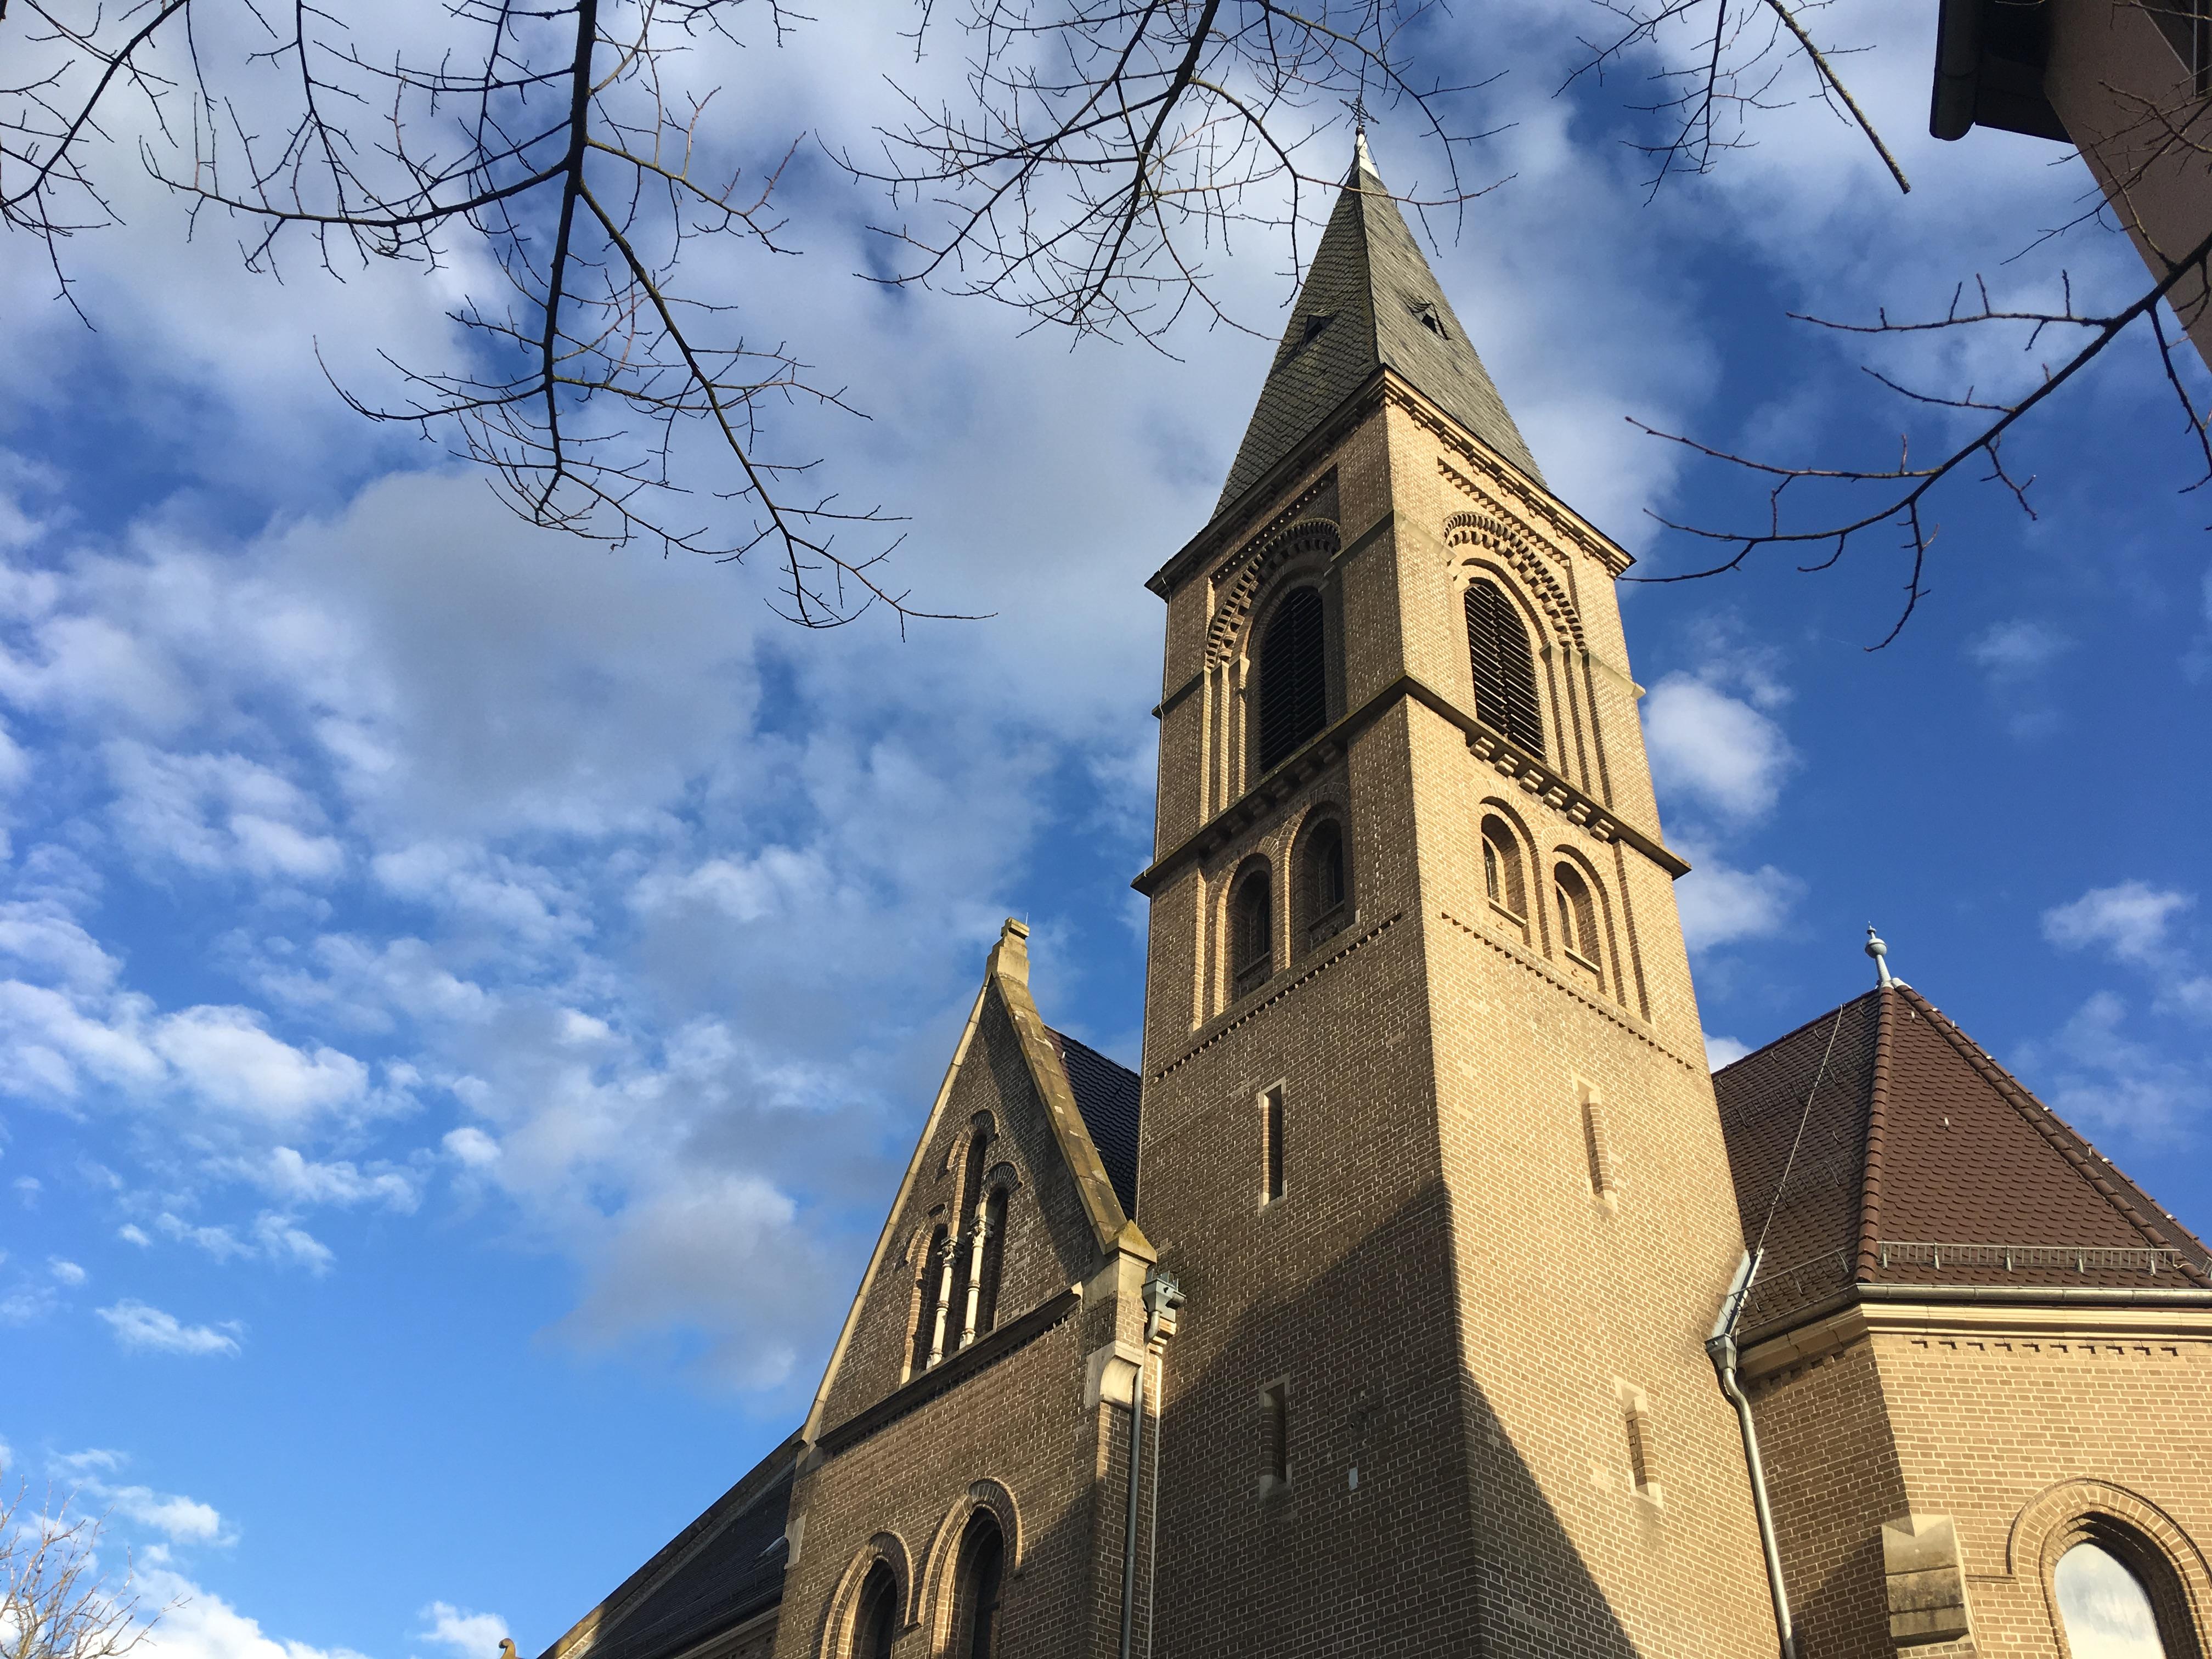 Patrozinium in St. Johannes - Katholische Kirche Backnang